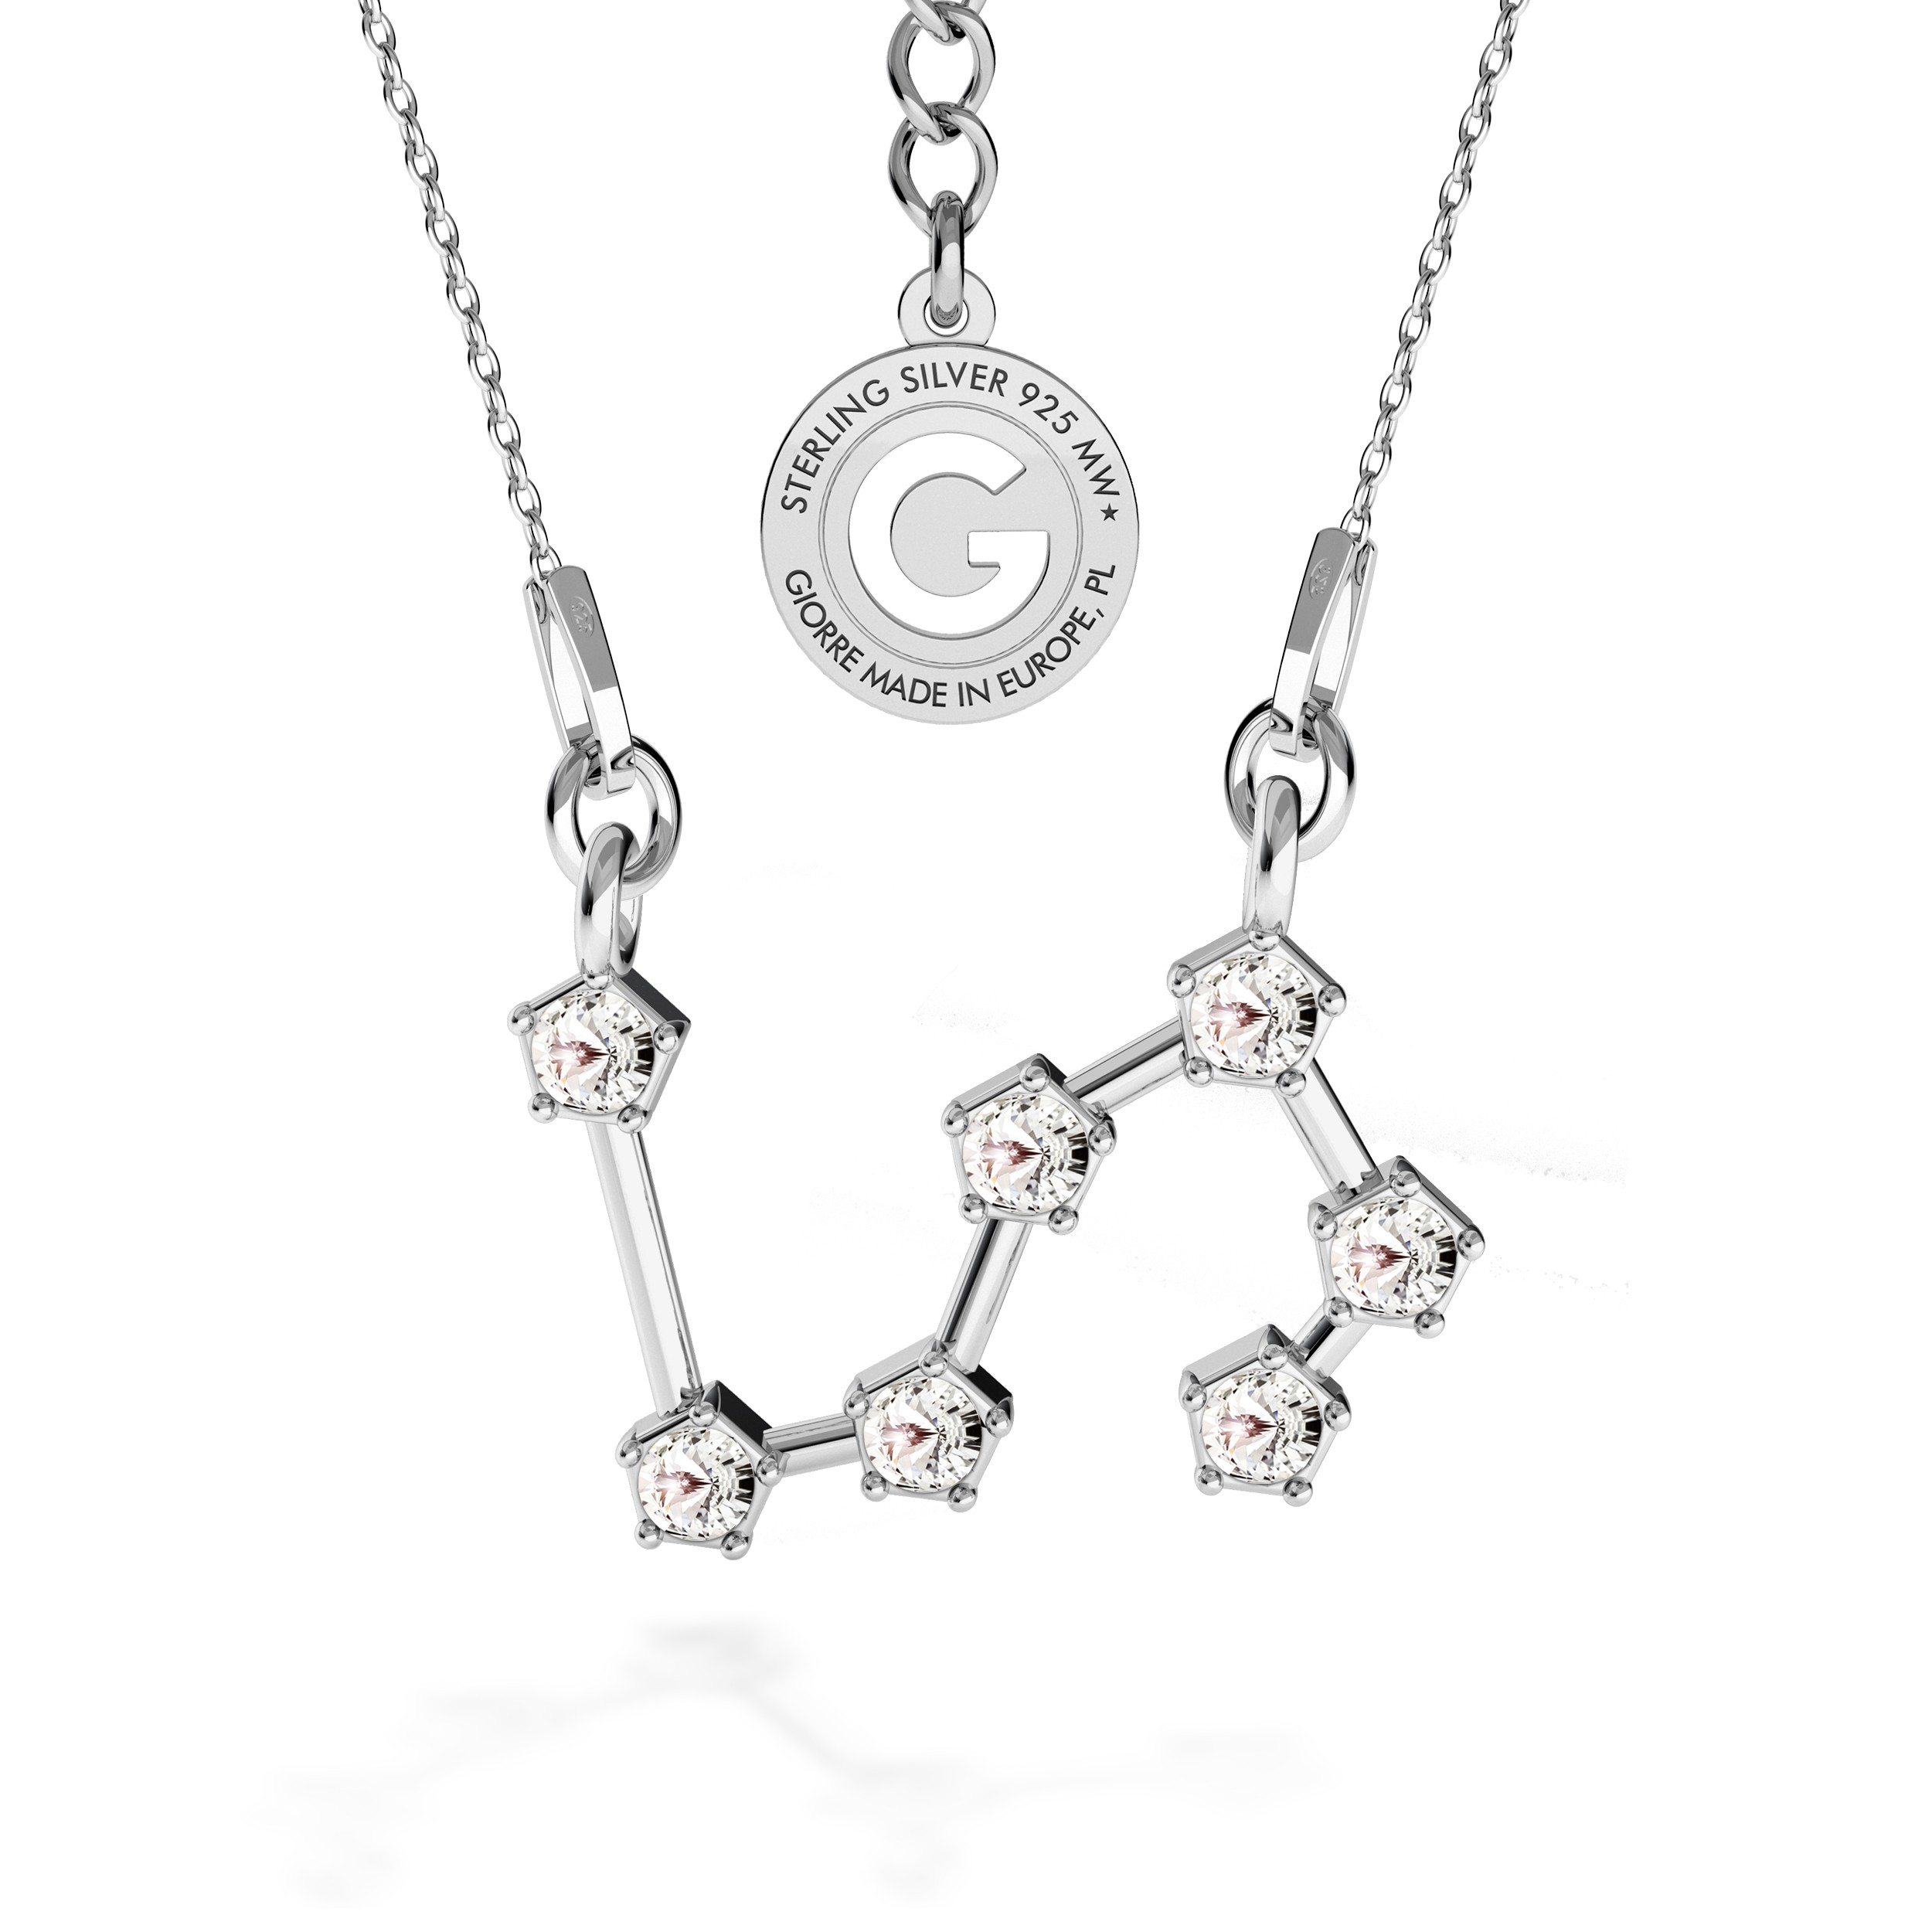 LION zodiac sign necklace with Swarovski Crystals silver 925